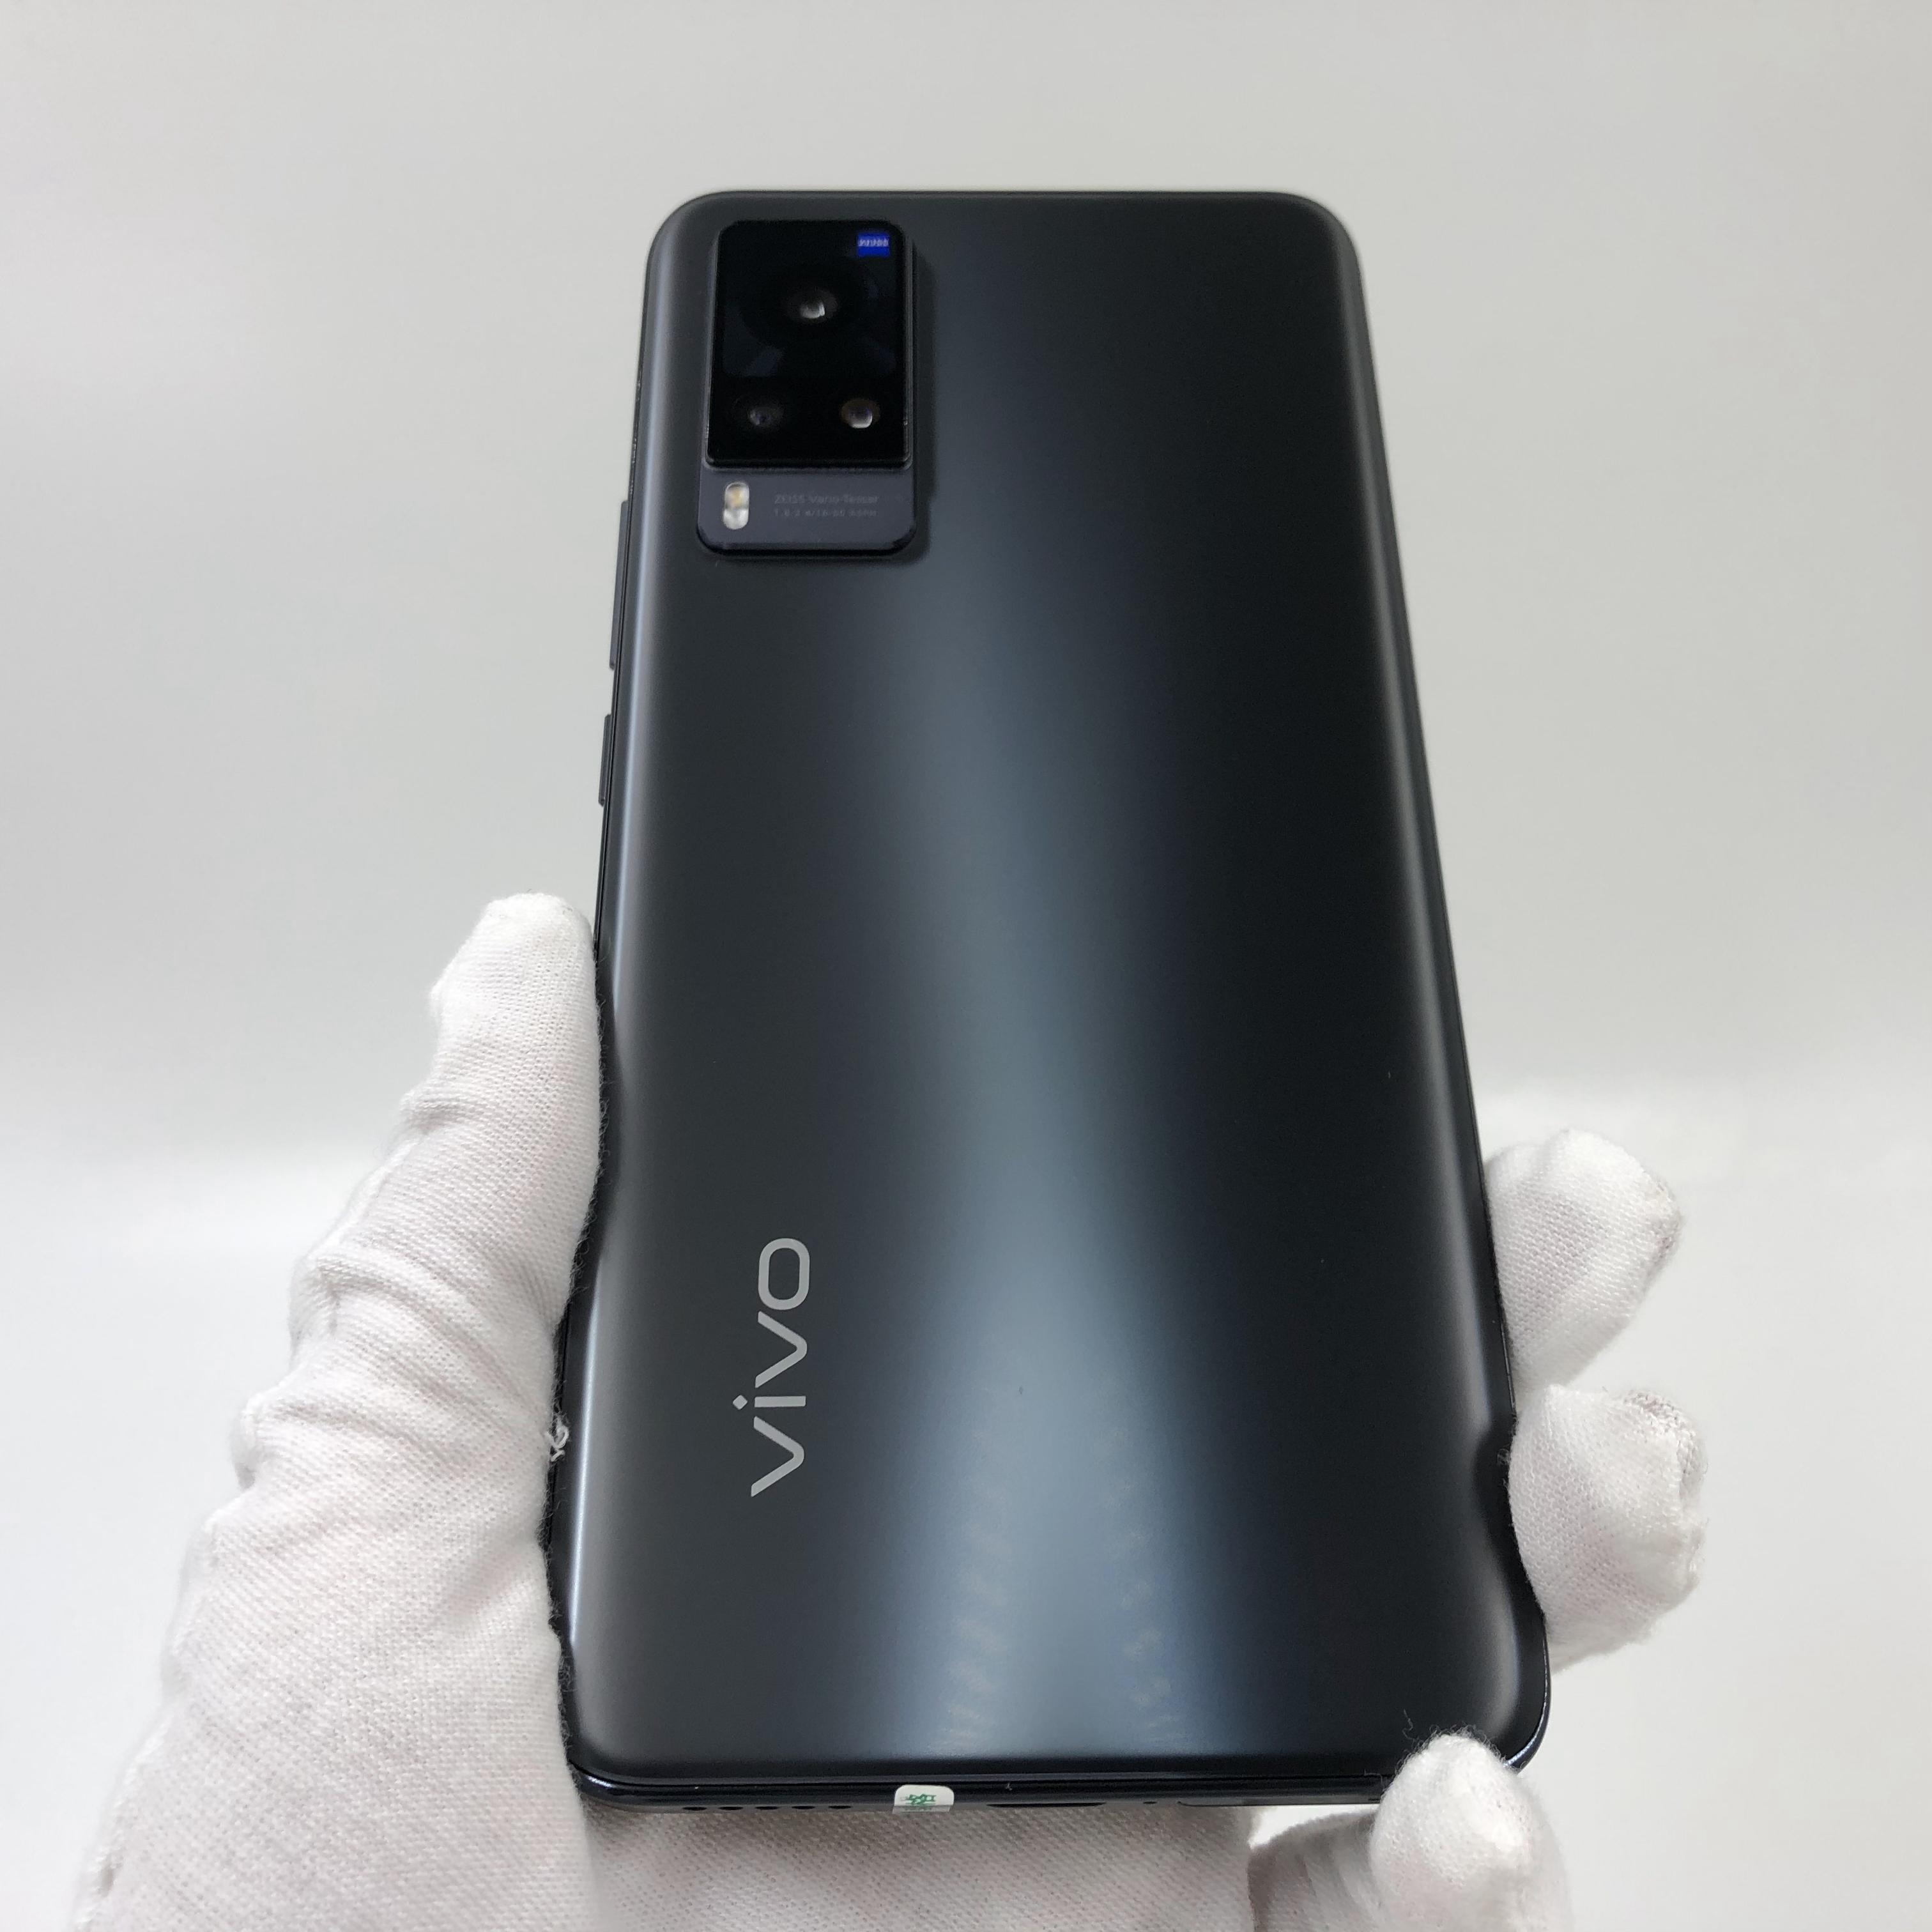 vivo【X60 5G】5G全网通 原力 8G/256G 国行 99新 真机实拍